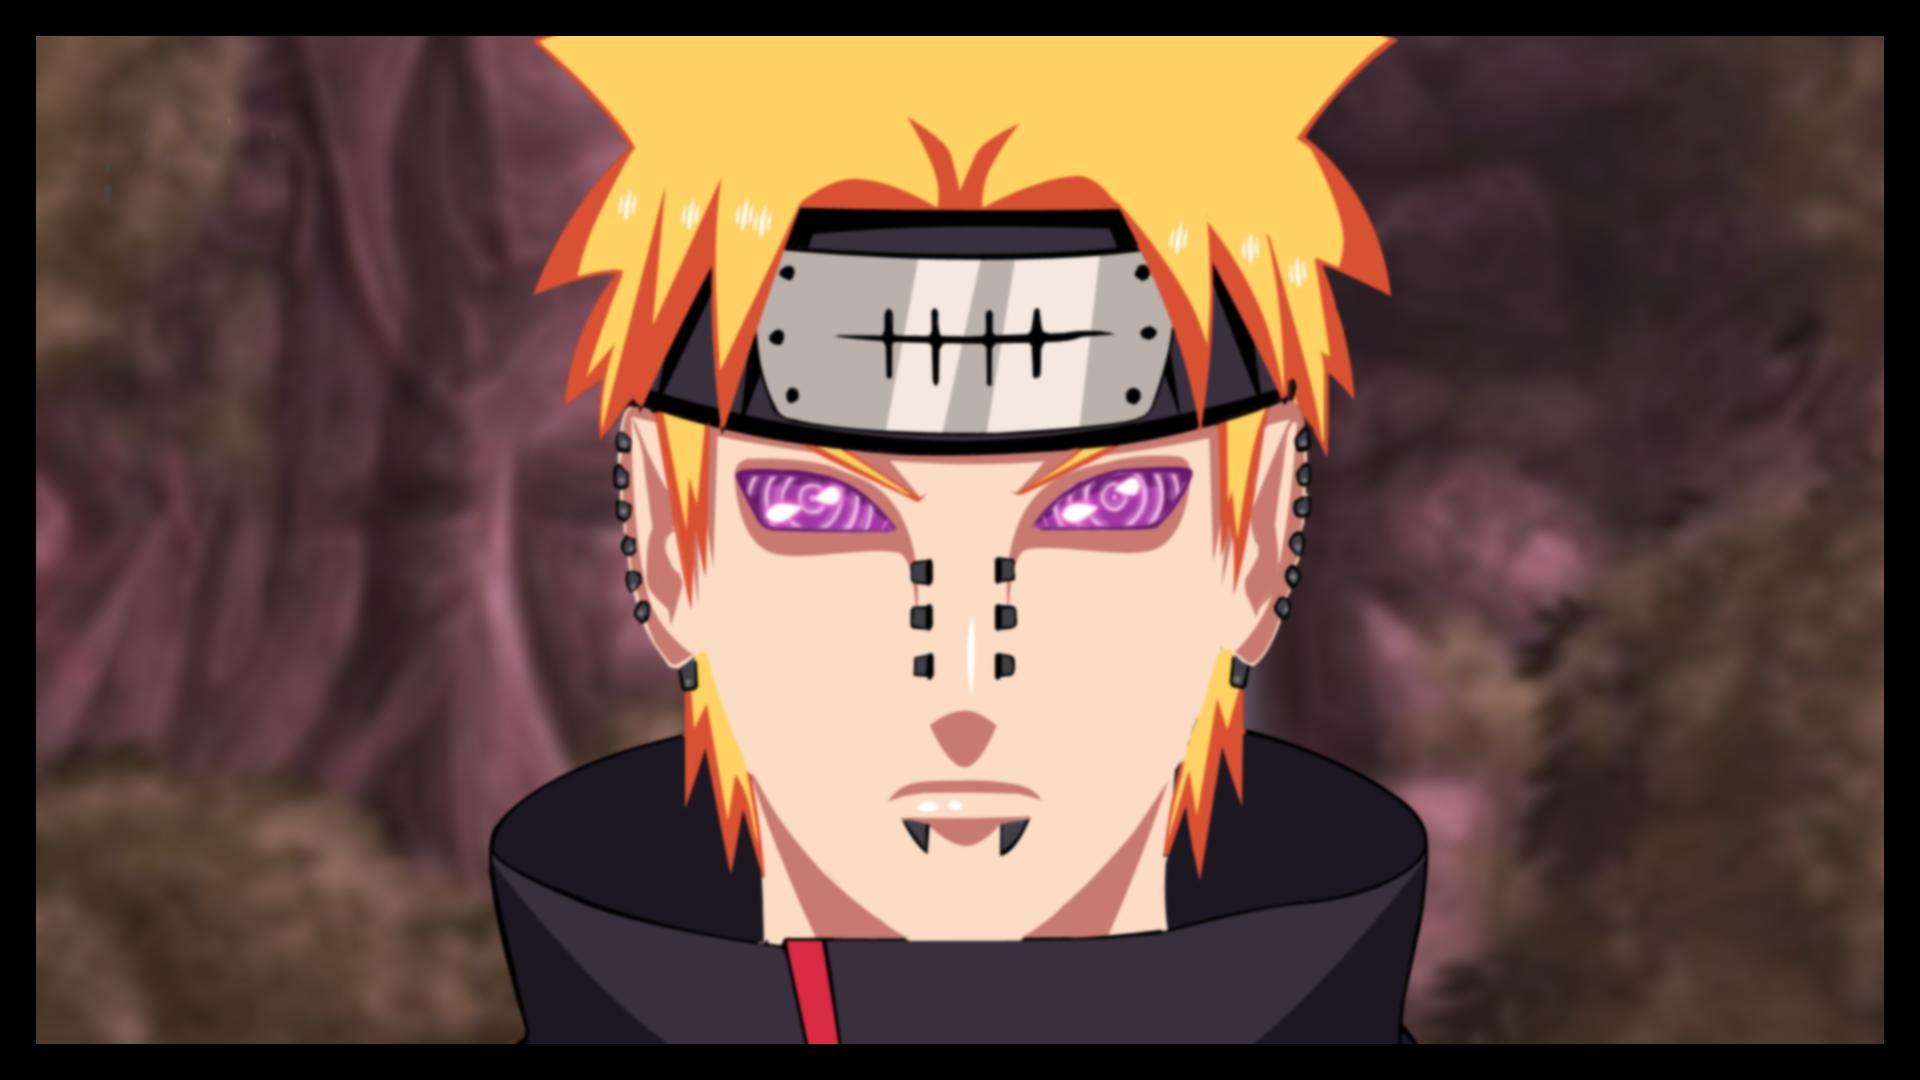 Naruto Pain Wallpaper - WallpaperSafari